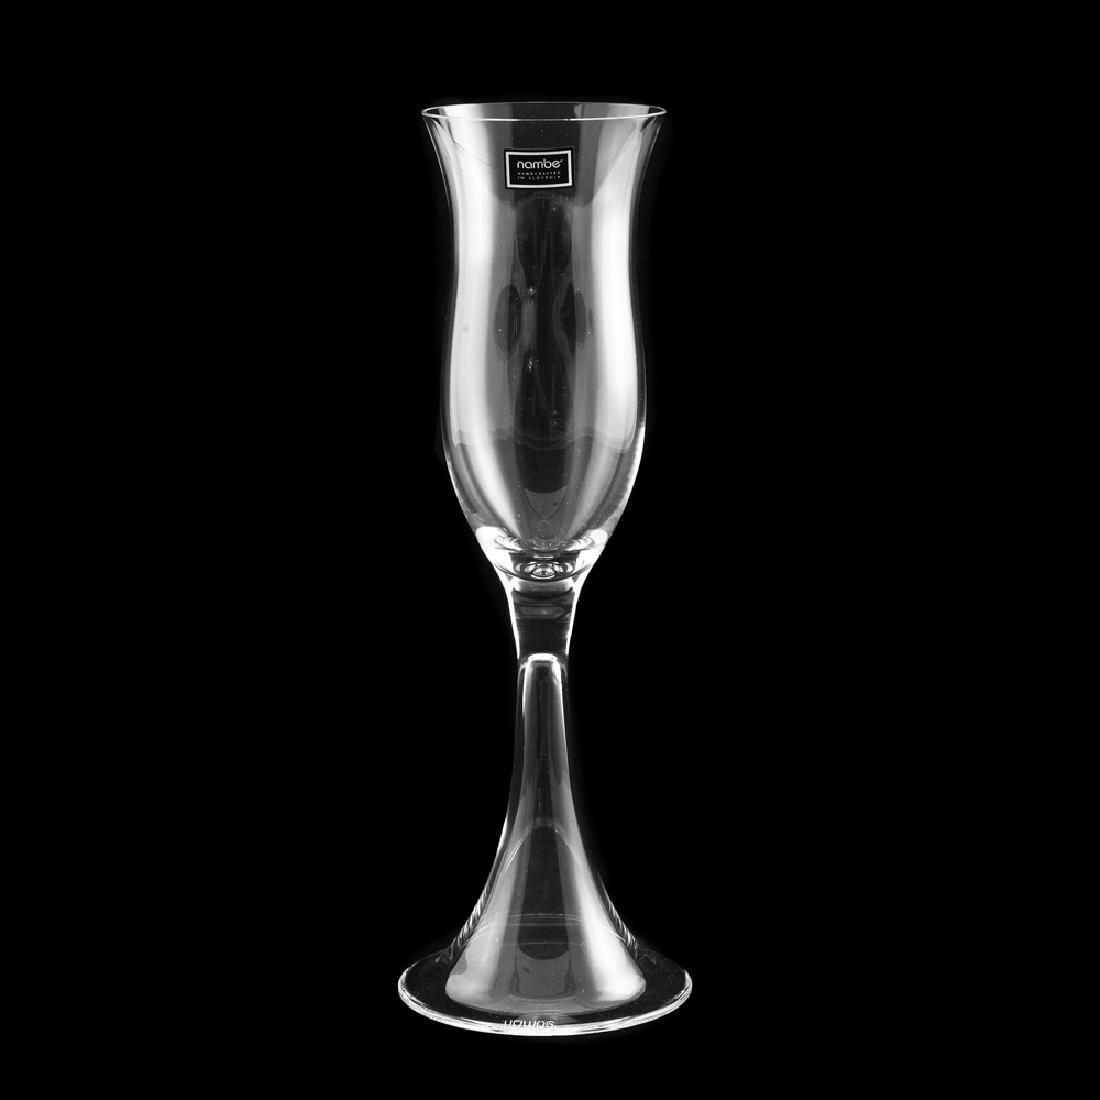 6 Zeisel Nambe Crystal Goblets, 3 sizes (2008) - 4